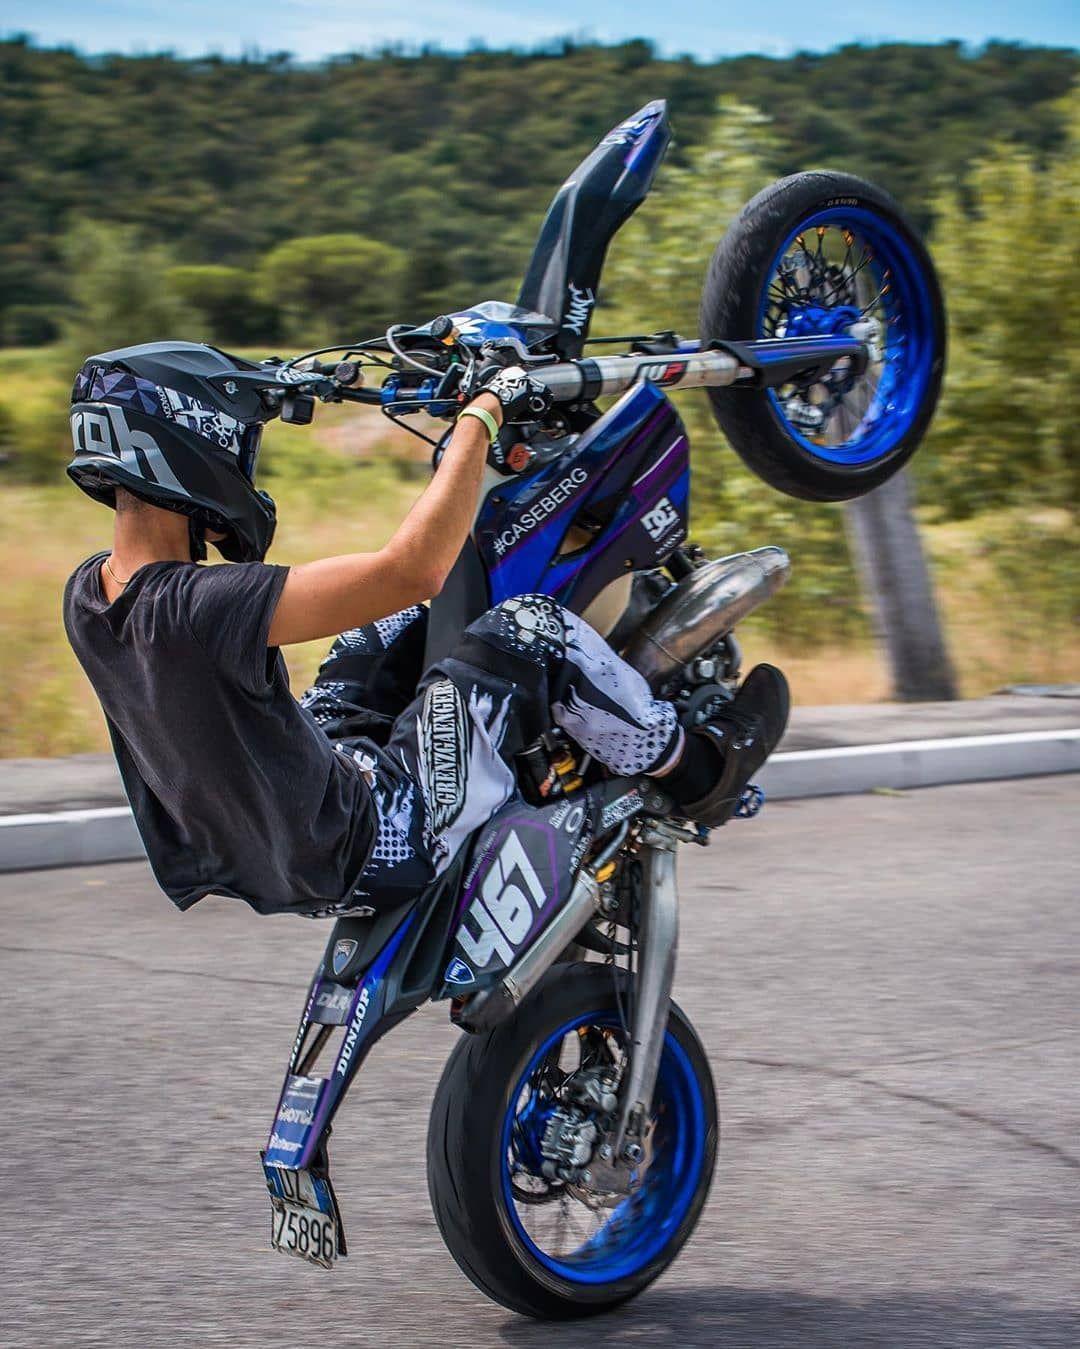 Wallpaper : motorcycling, supermoto, motorcycle racing